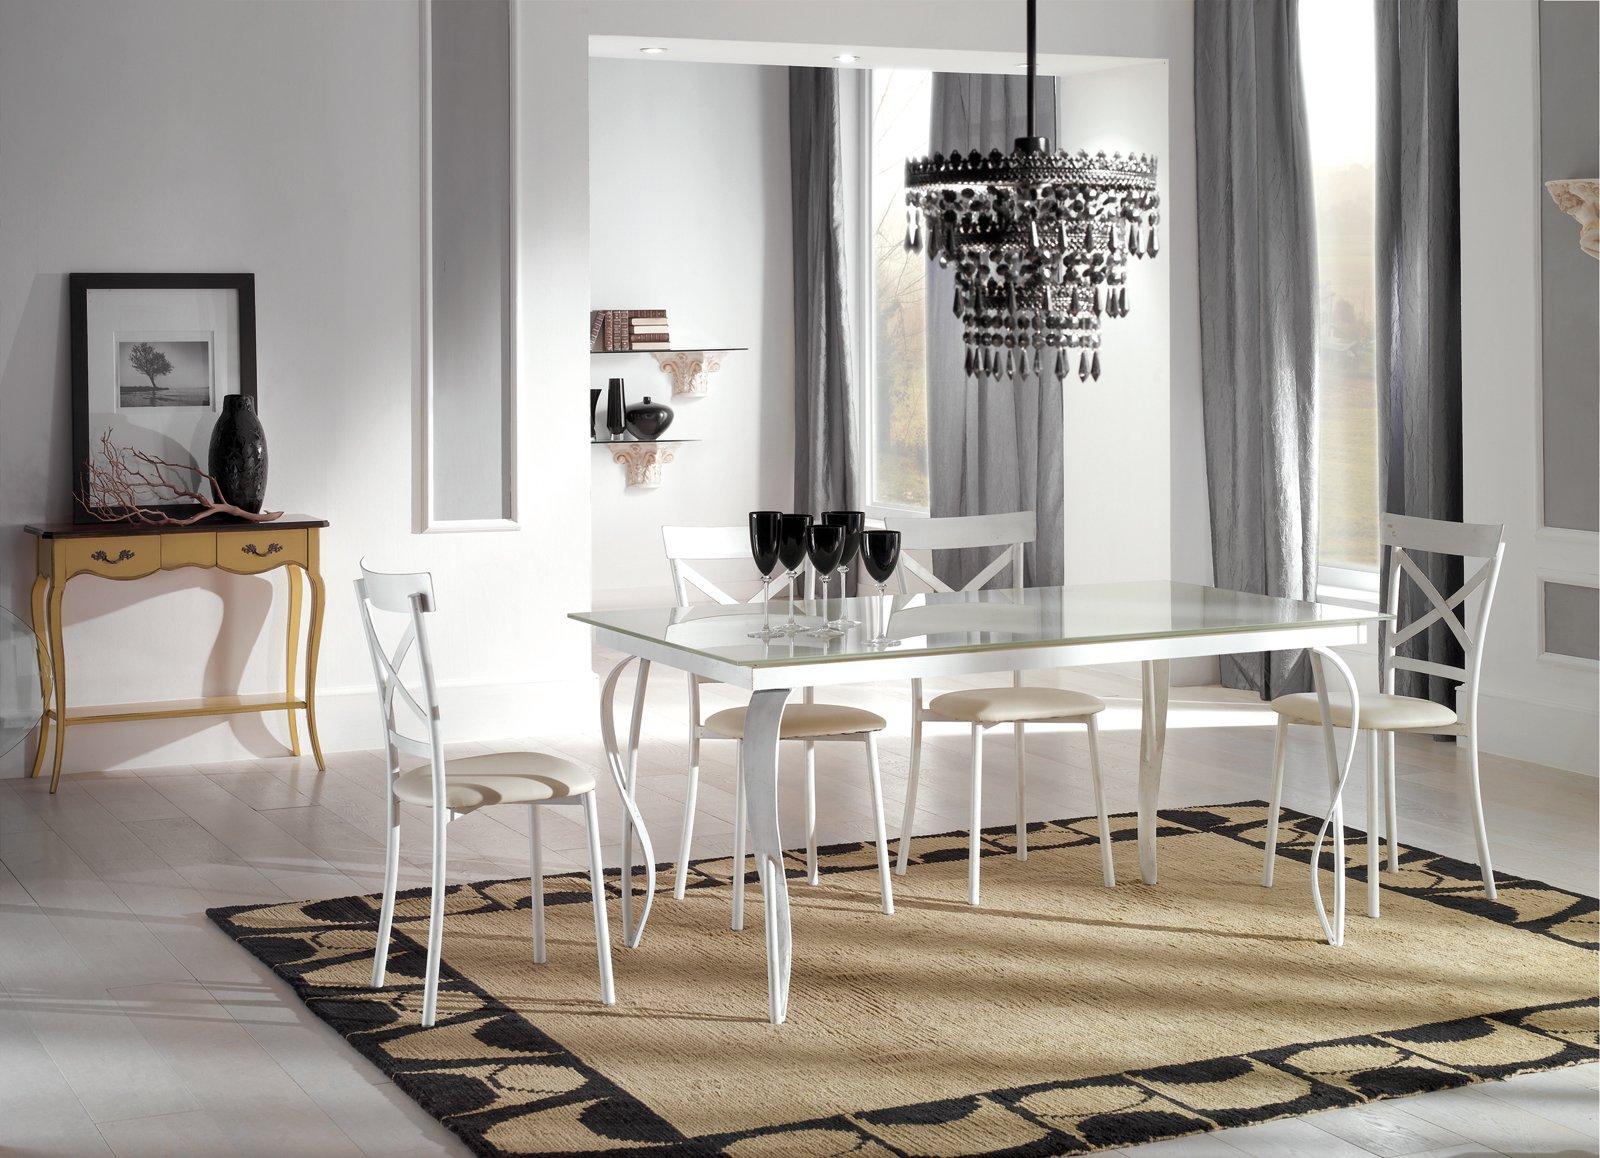 1158 Jpeg 1215kB Tavoli Da Cucina Tavoli Da Pranzo Tavoli Moderni #80684B 1600 1158 Tavoli Da Pranzo Moderni In Cristallo